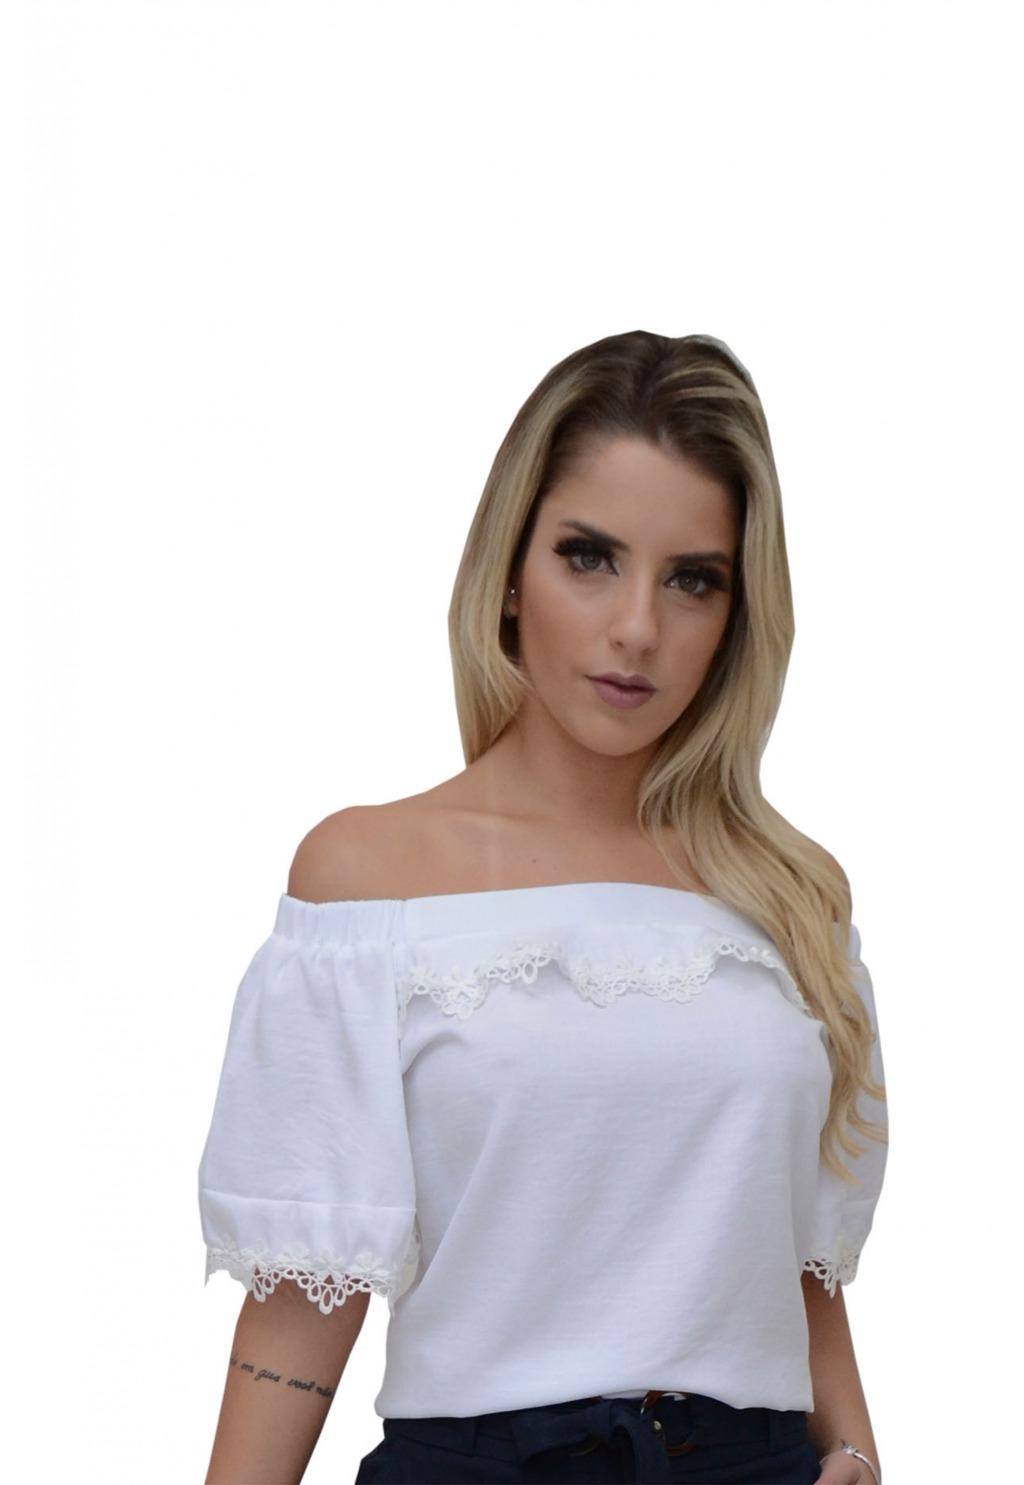 Blusa Mamorena ombro elástico com babado e renda